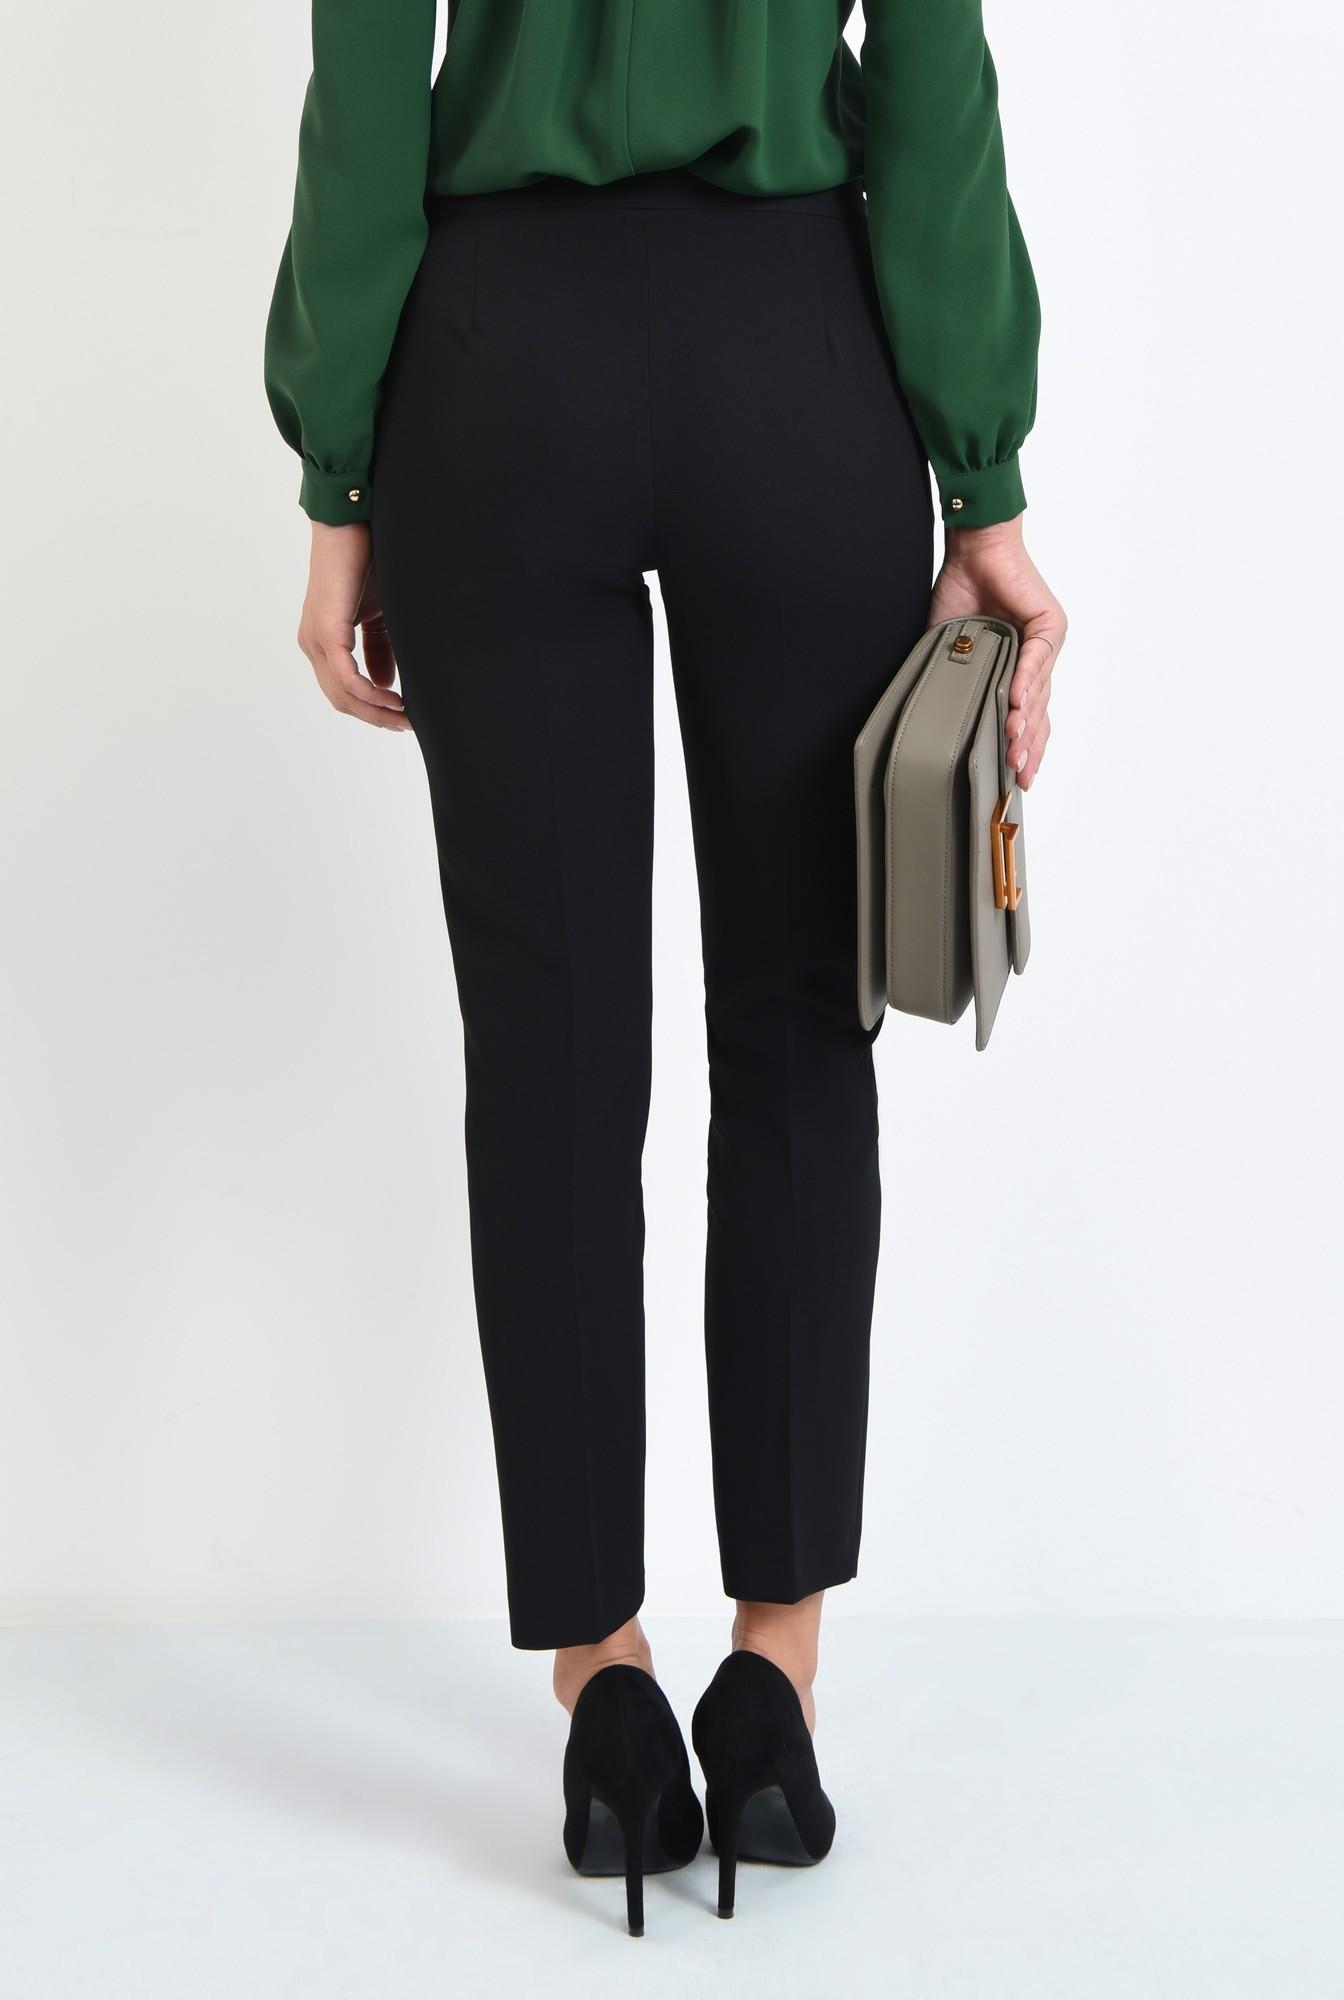 1 - pantaloni casual, negru, talie medie, buzunare